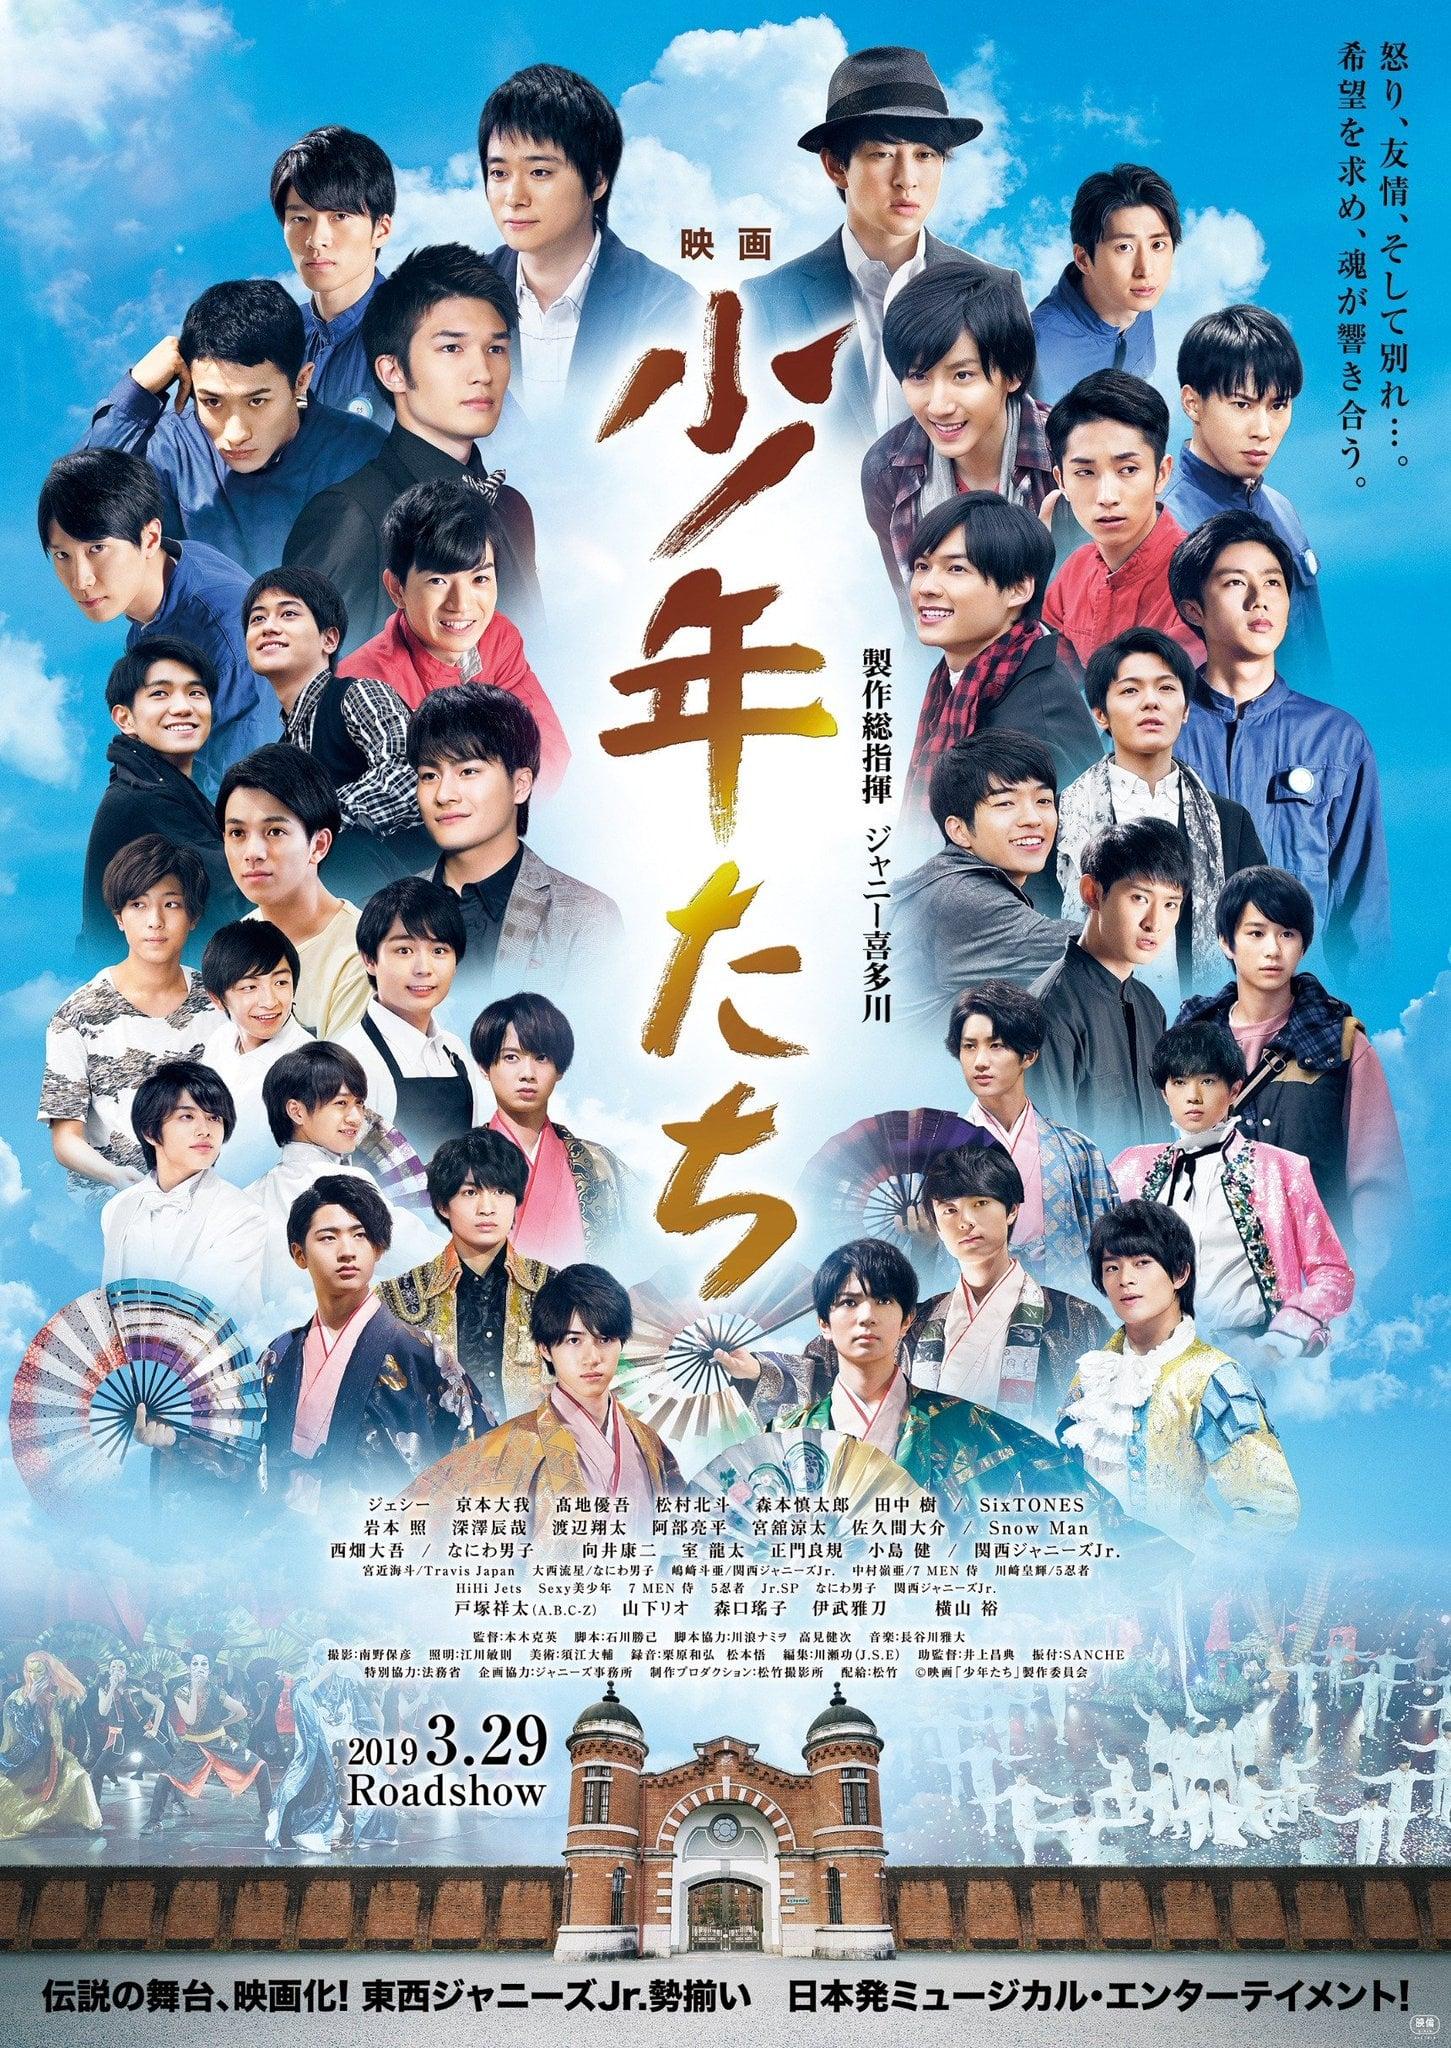 Shounentachi Movie